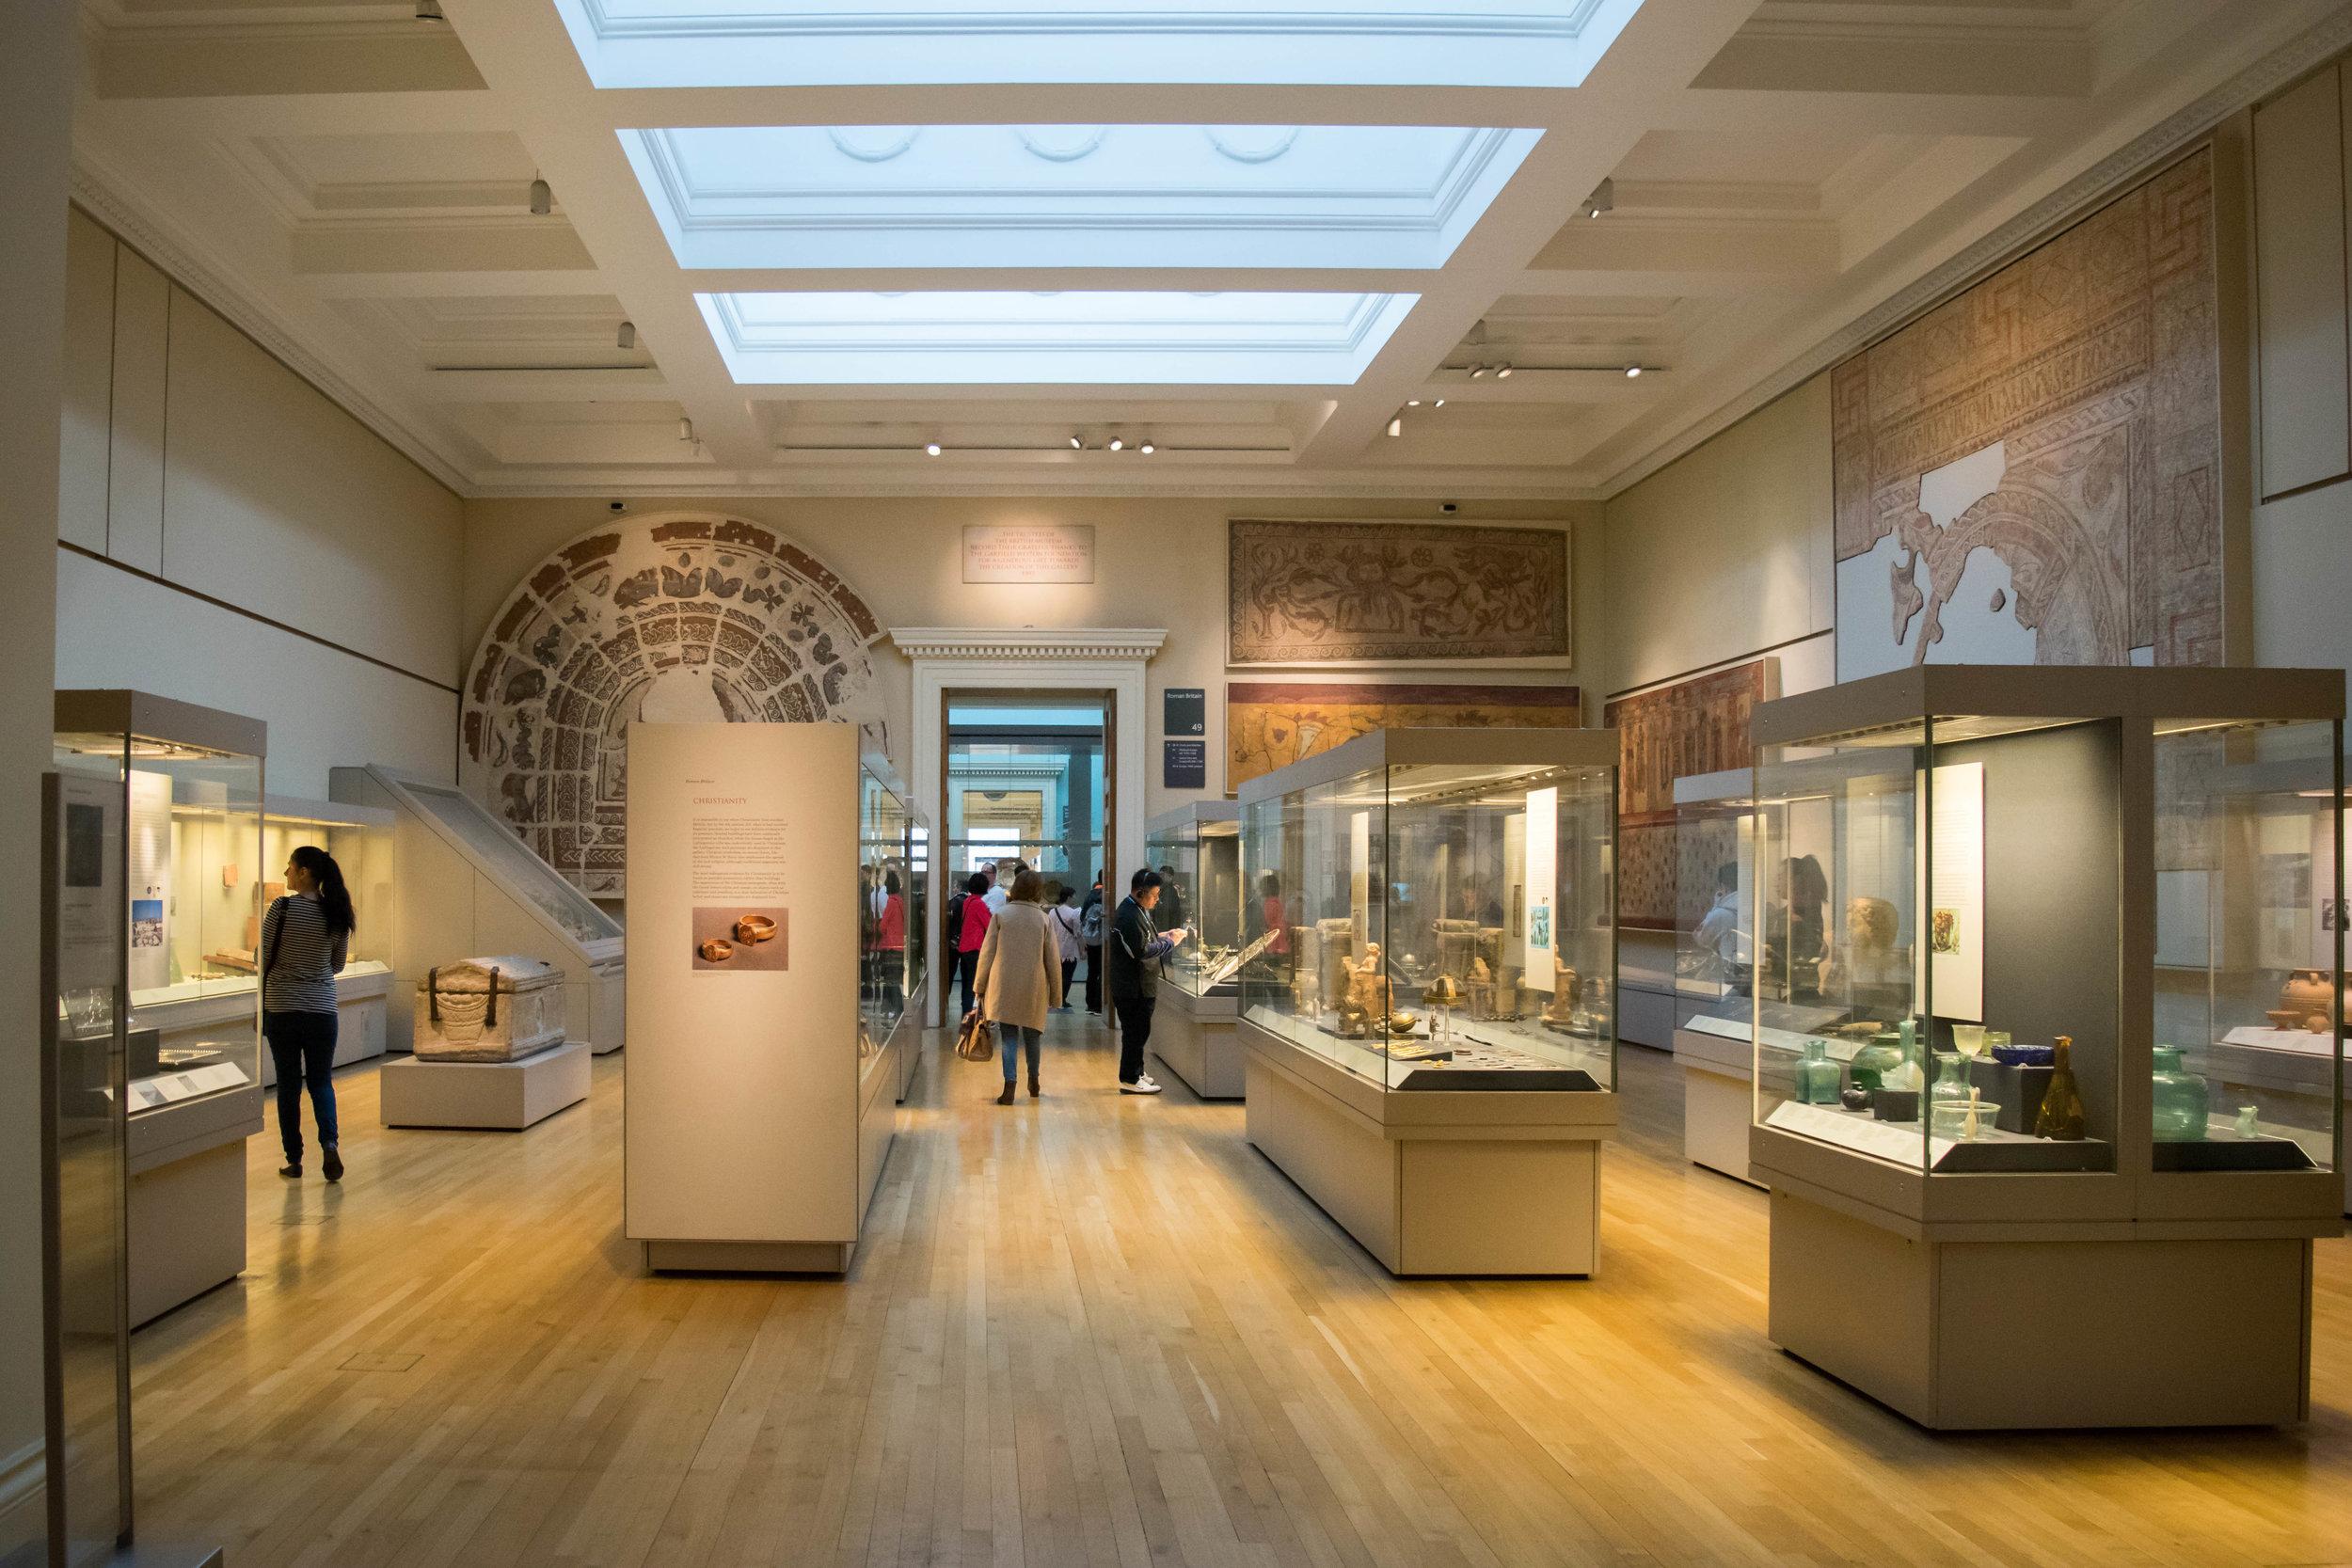 Roman Britain display in the British Museum